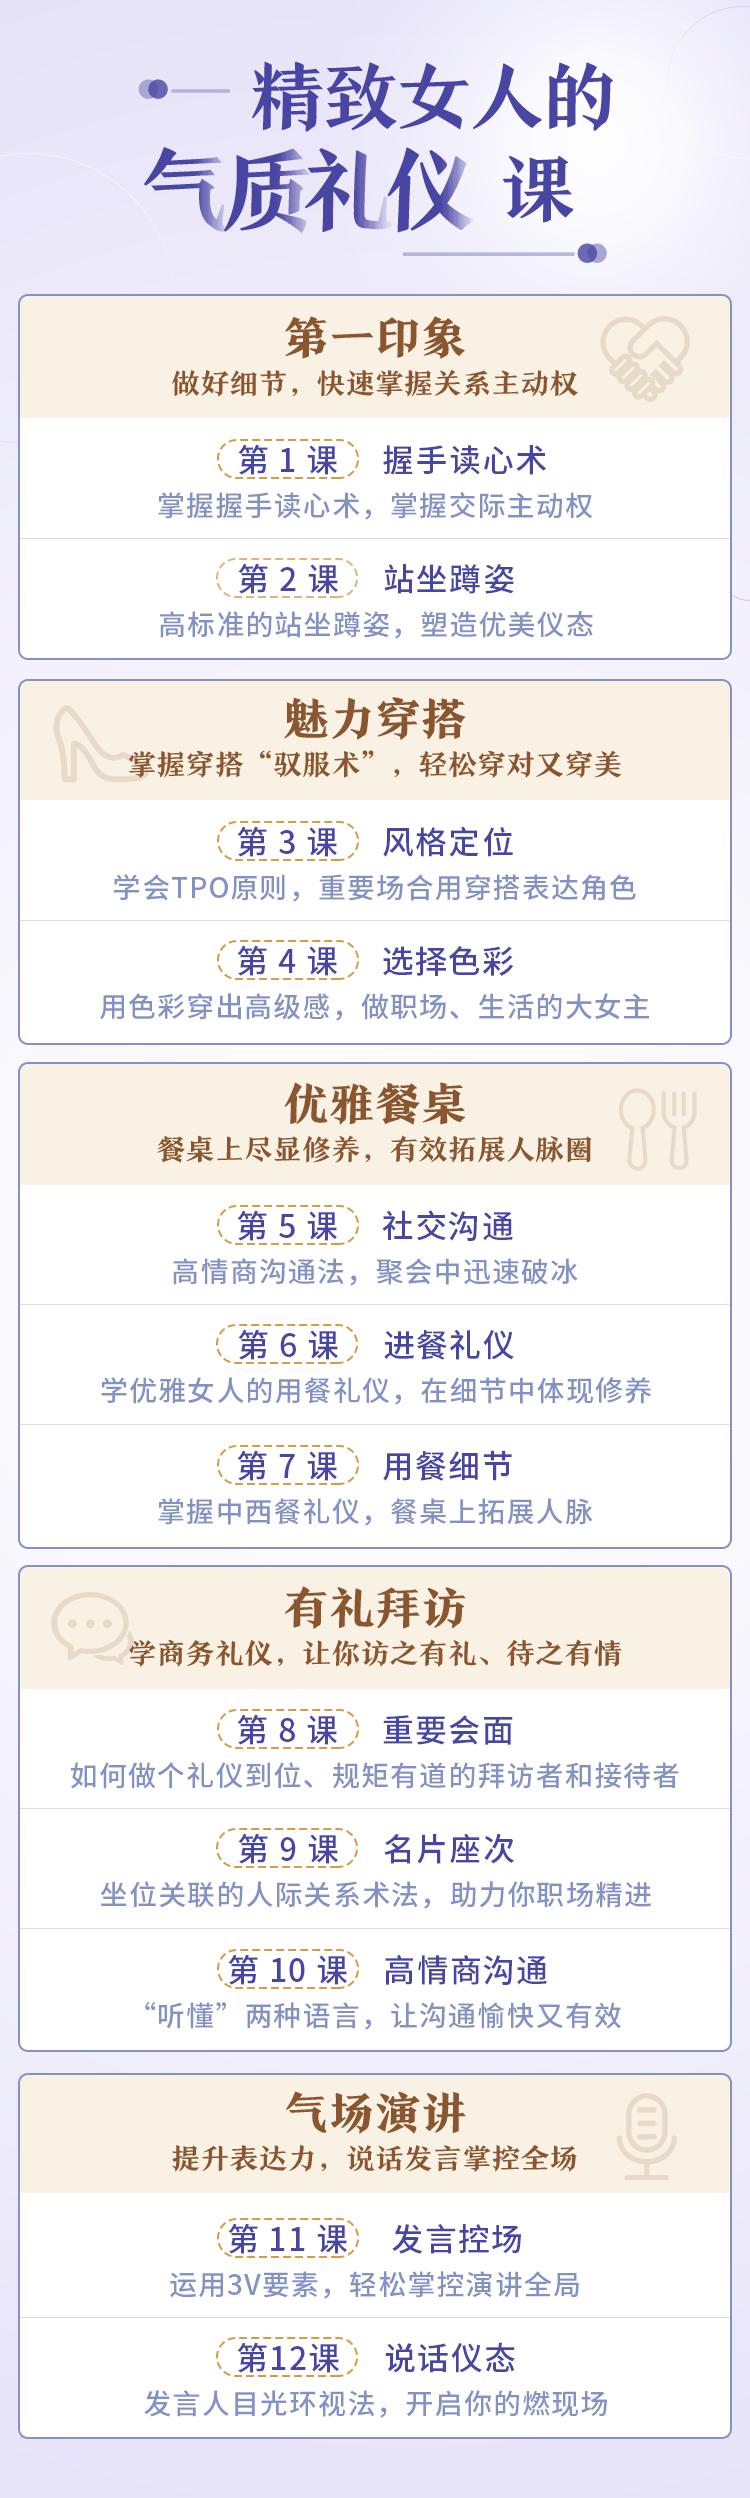 课表(修改1) .png